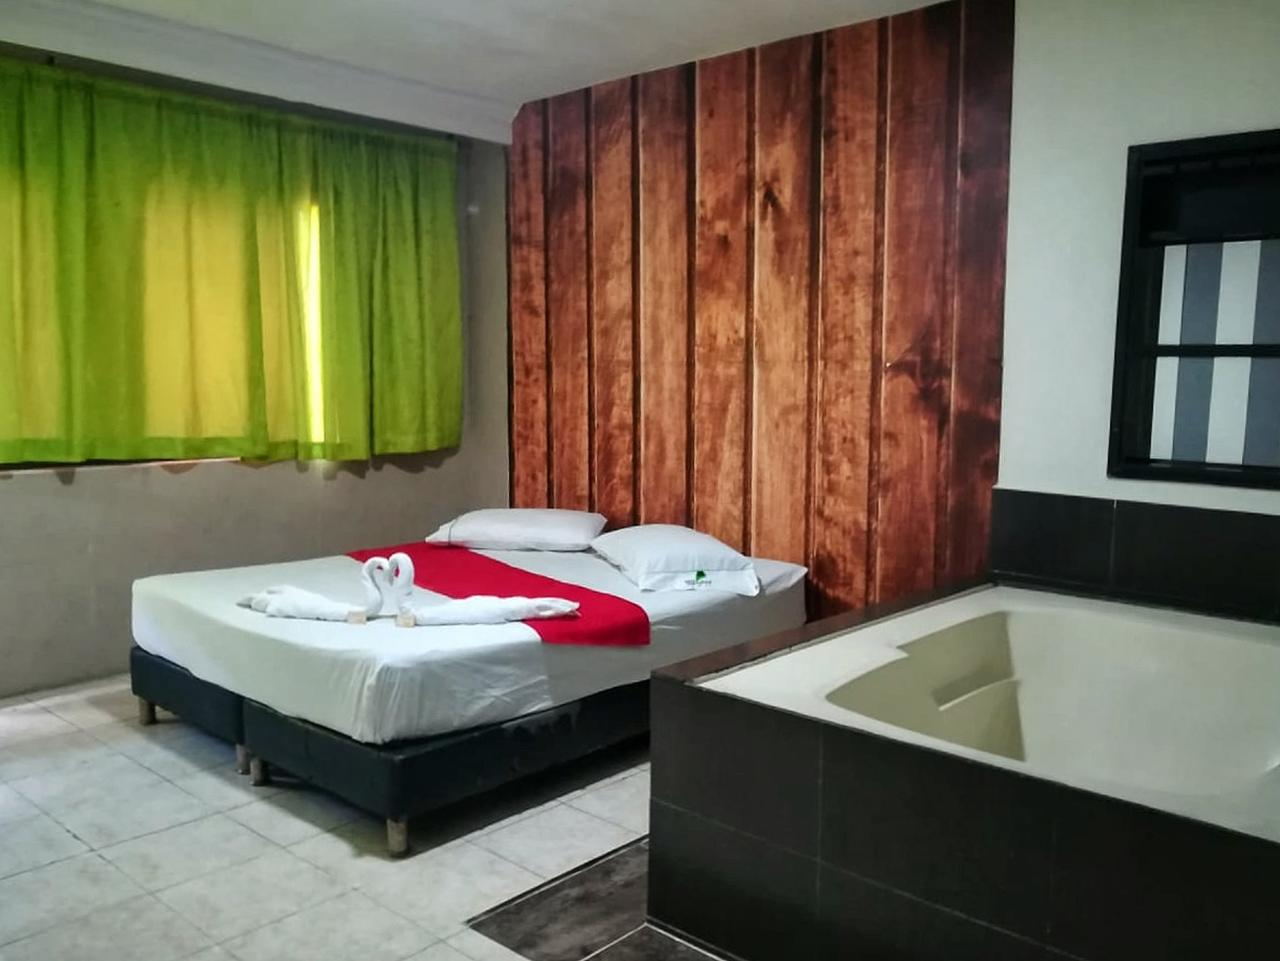 Habitación Bañera en Paradise 33 : MotelNow